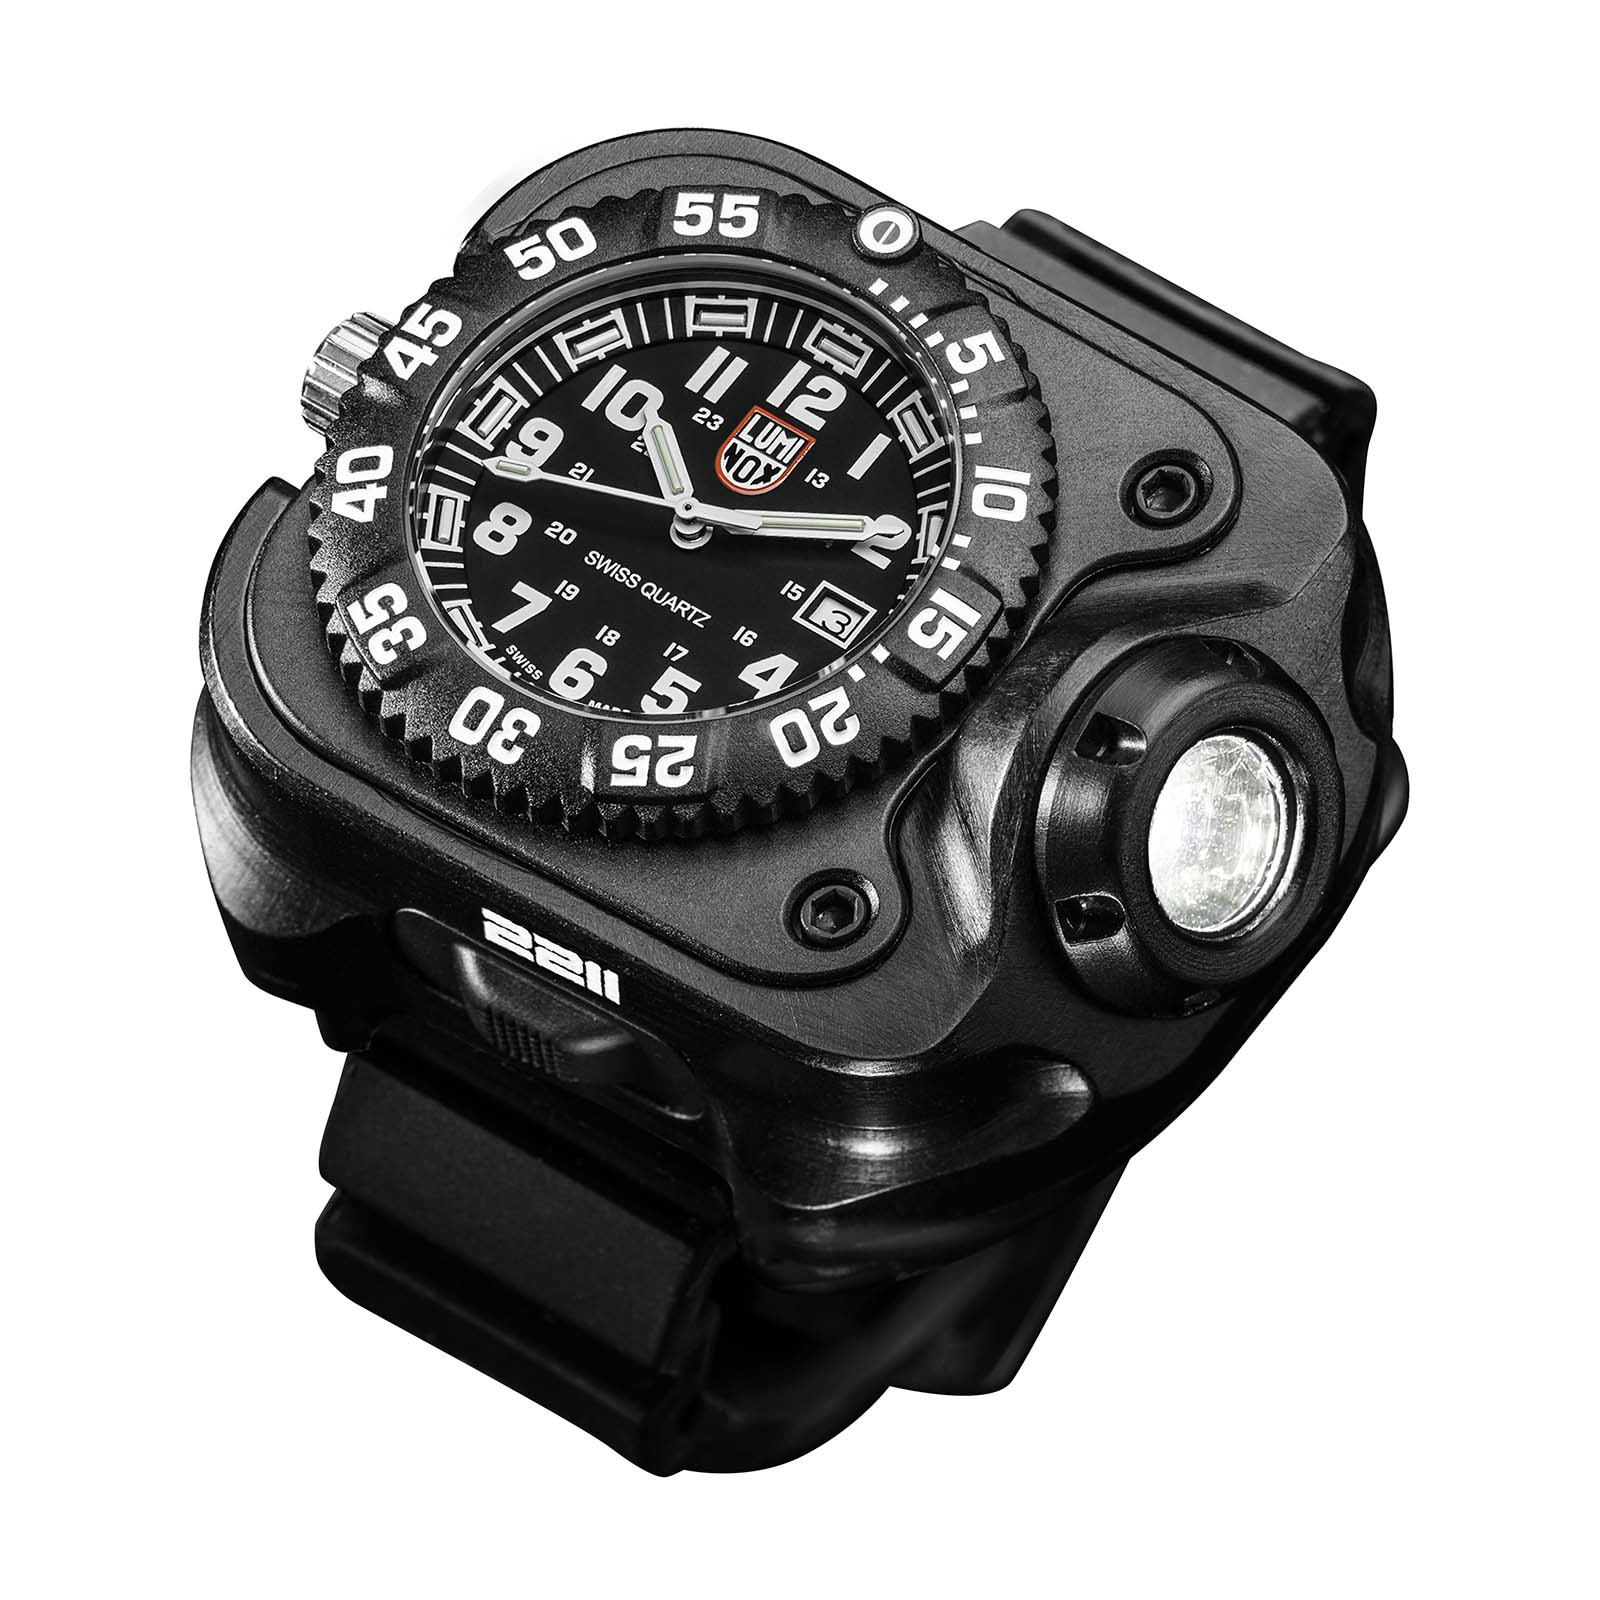 New SureFire 2211 Luminox Wristlight Watch